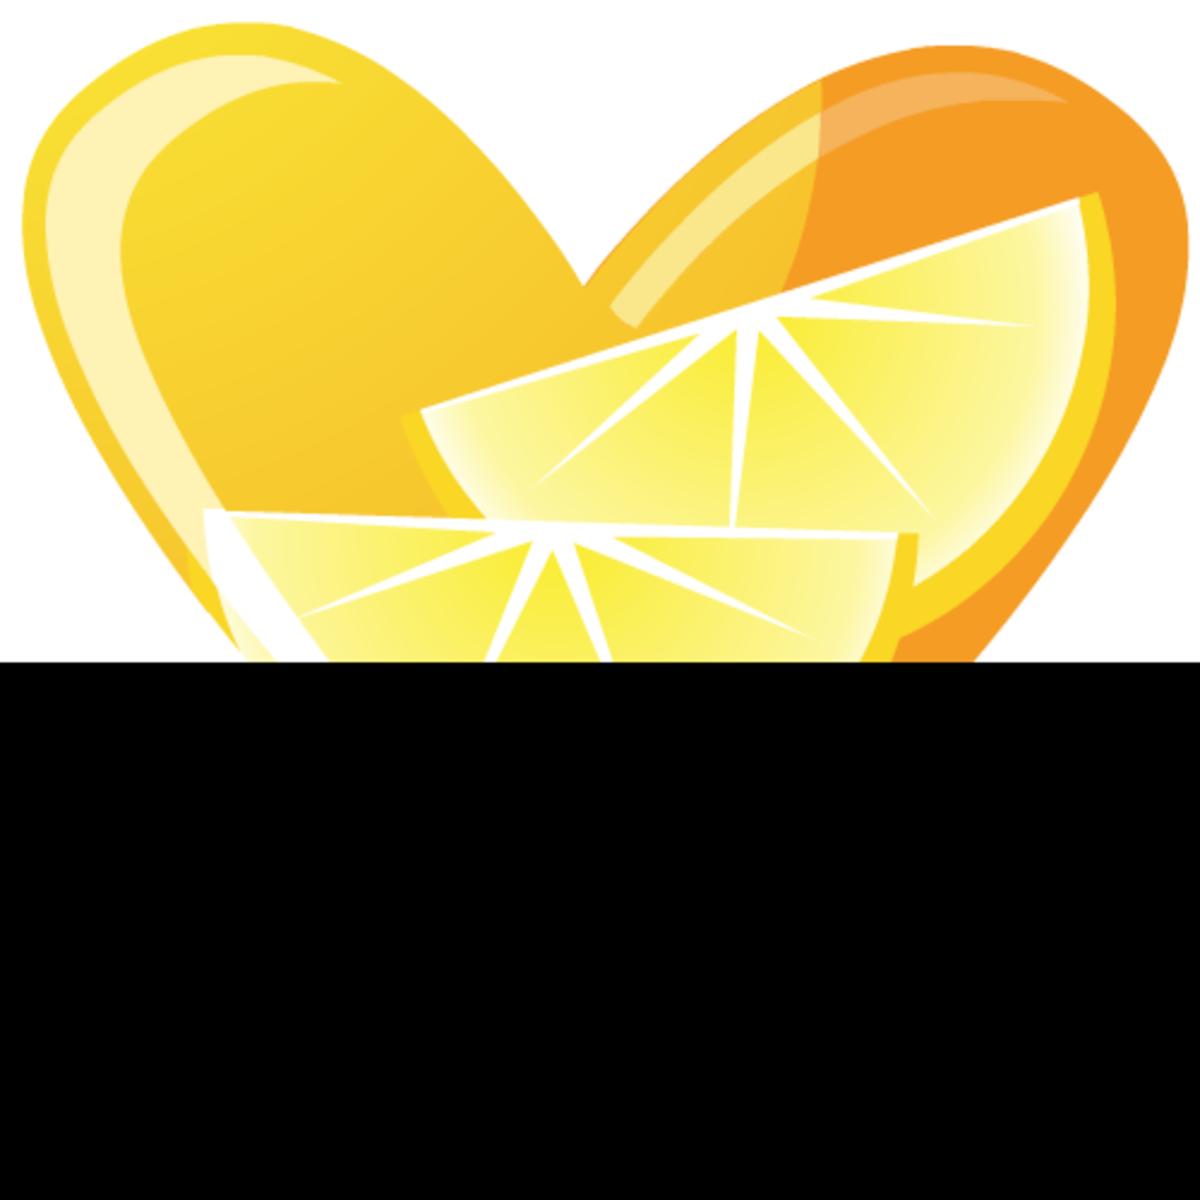 Lemon heart clip art image